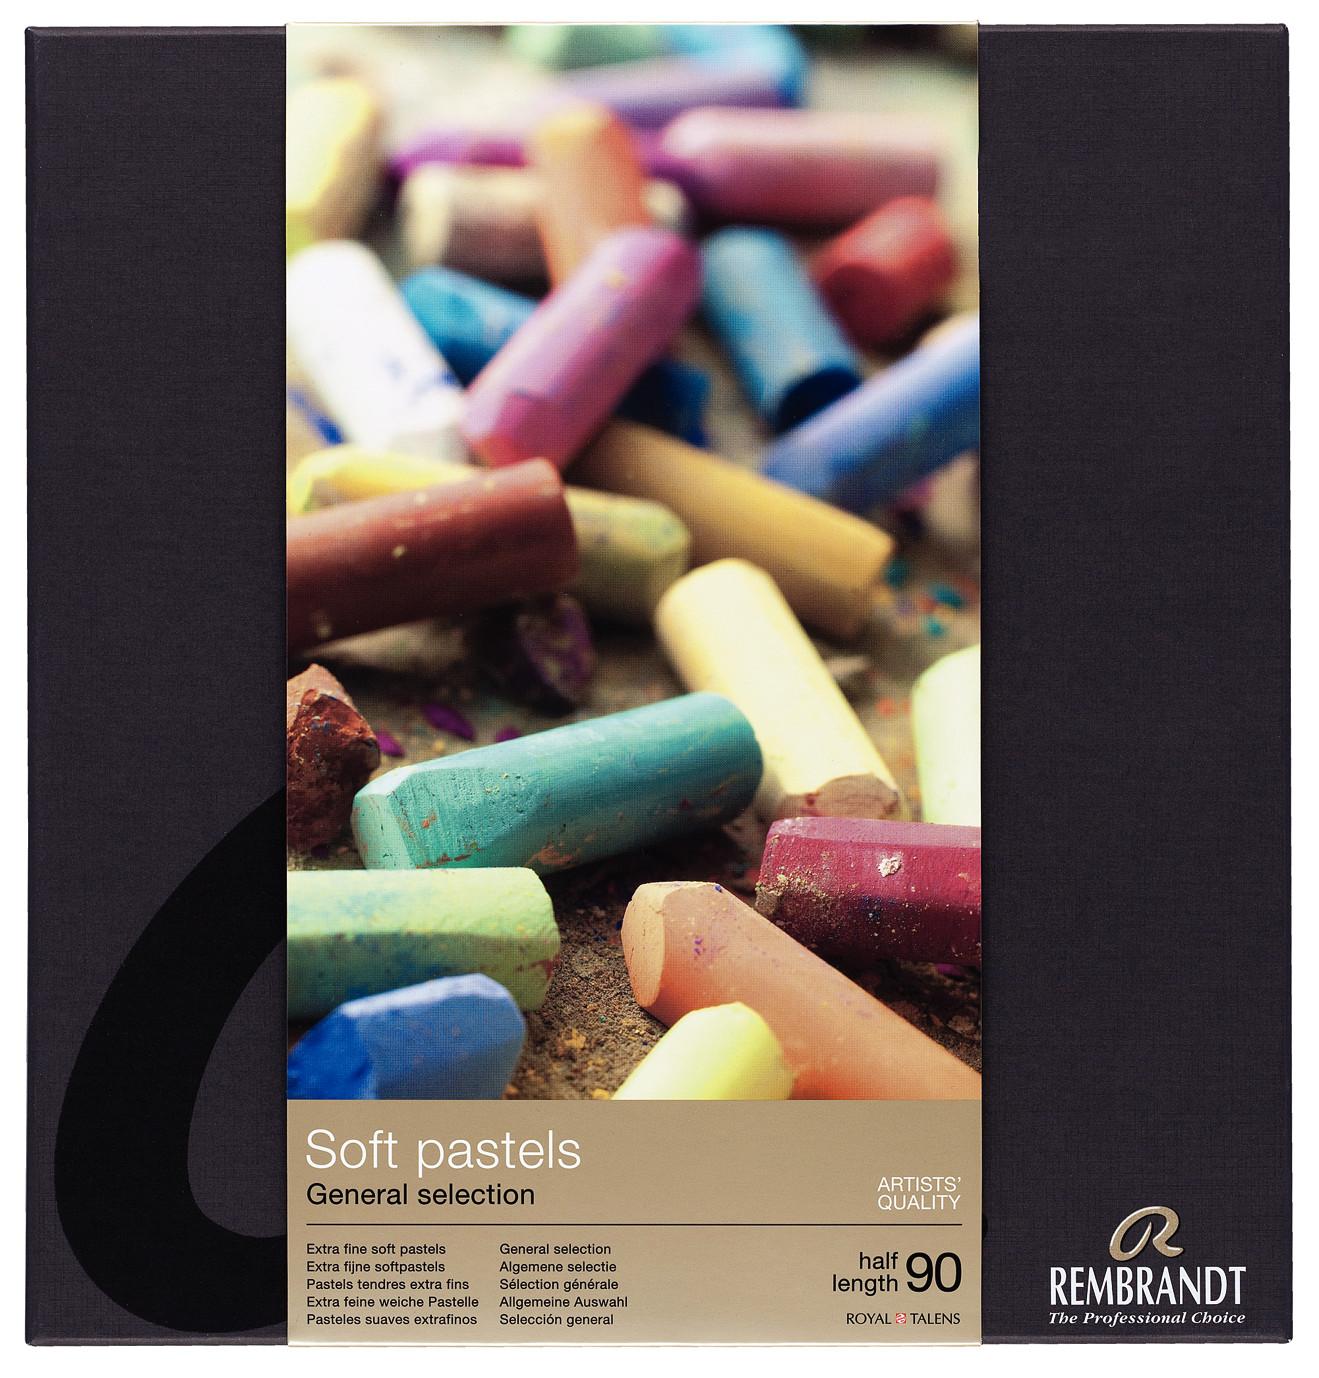 Rembrandt Soft Pastels General Selection Professional Set 300C90.5